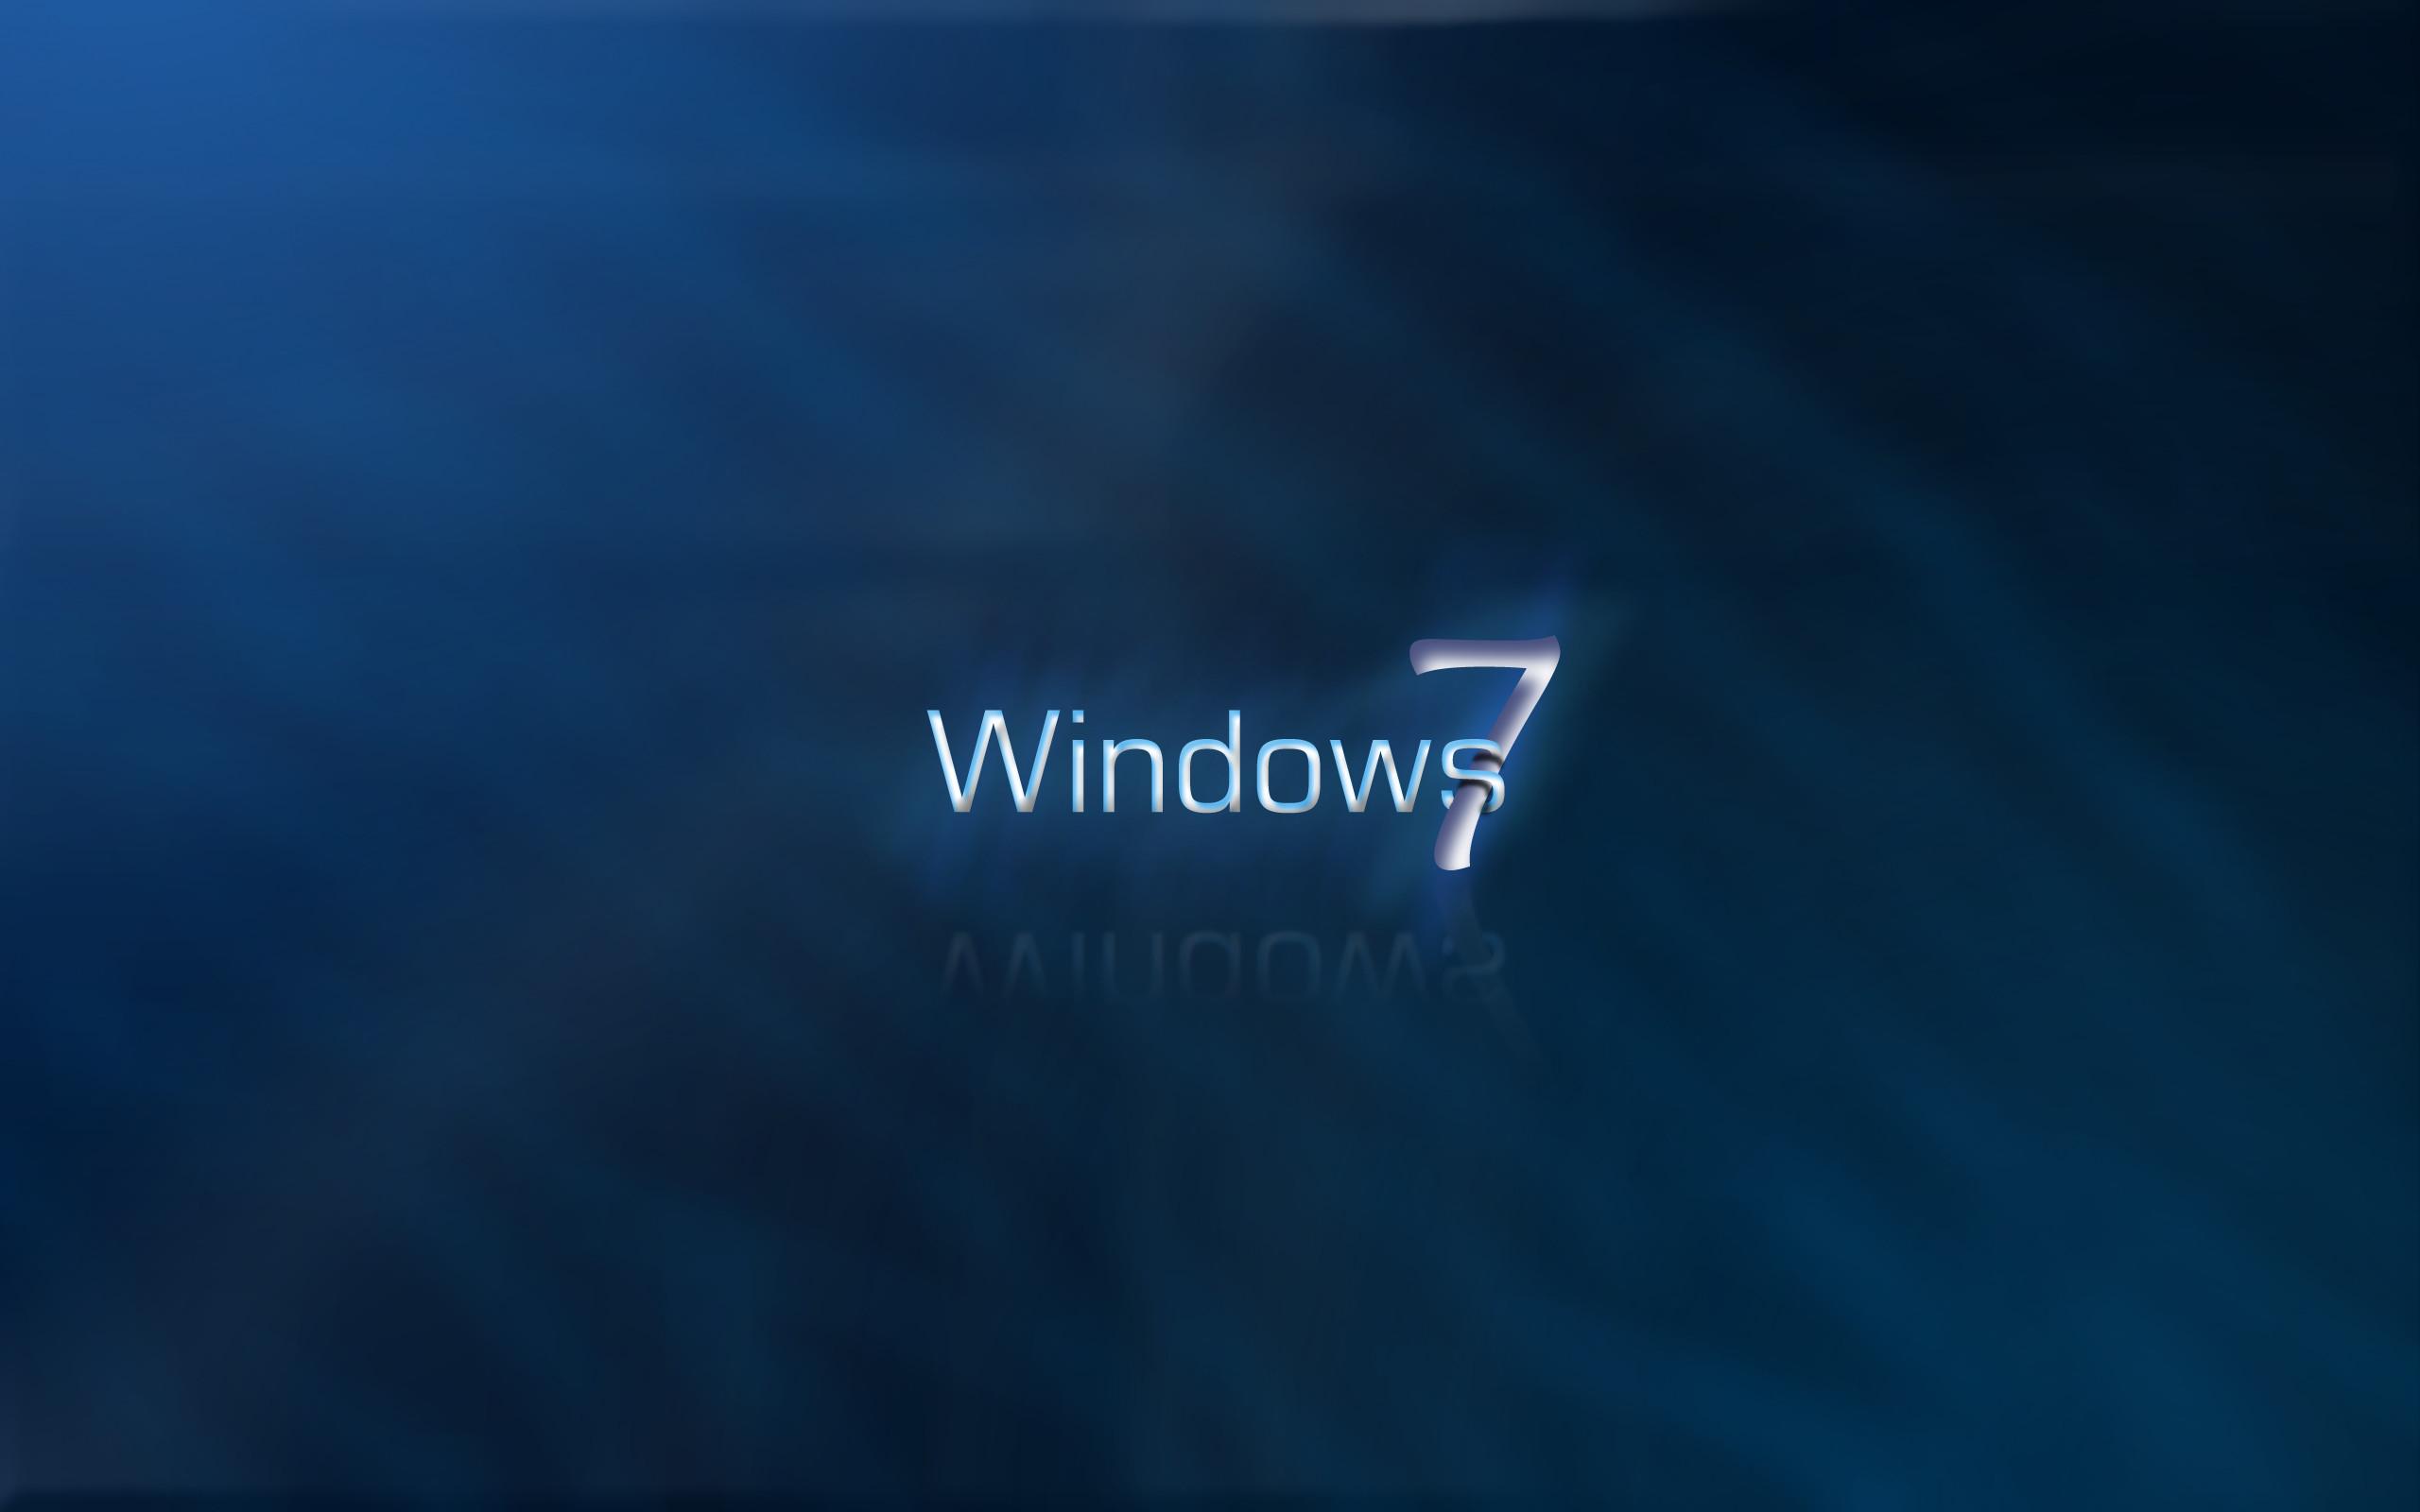 Ultra High Definition Wallpaper - Fondos De Pantalla Windows 7 , HD Wallpaper & Backgrounds